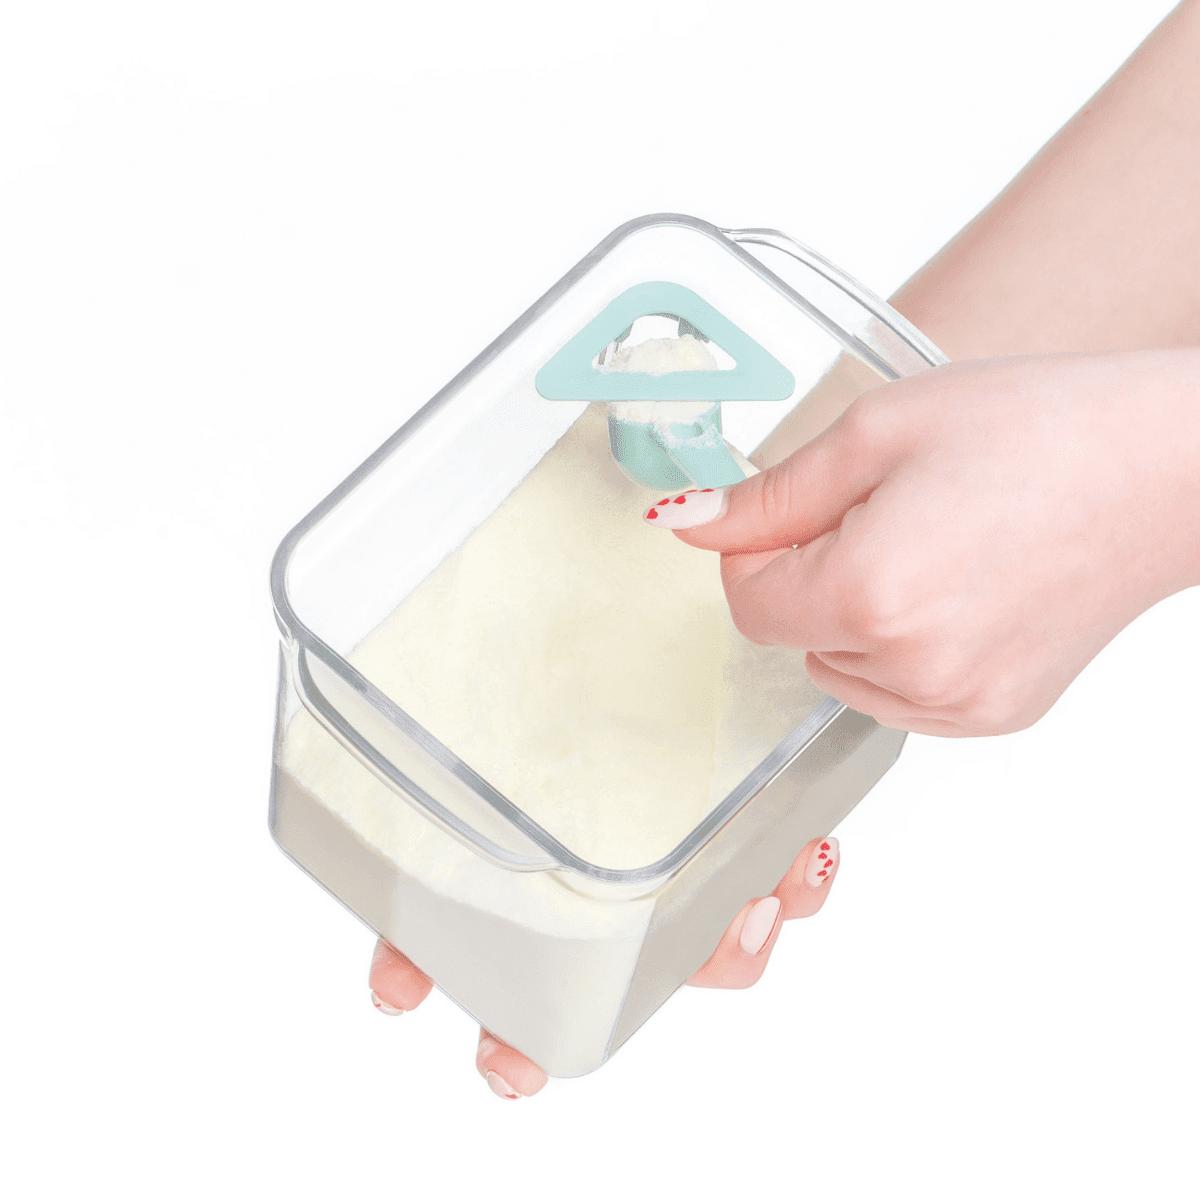 Кутия за адаптирано мляко на прах - OKSERTA One Touch